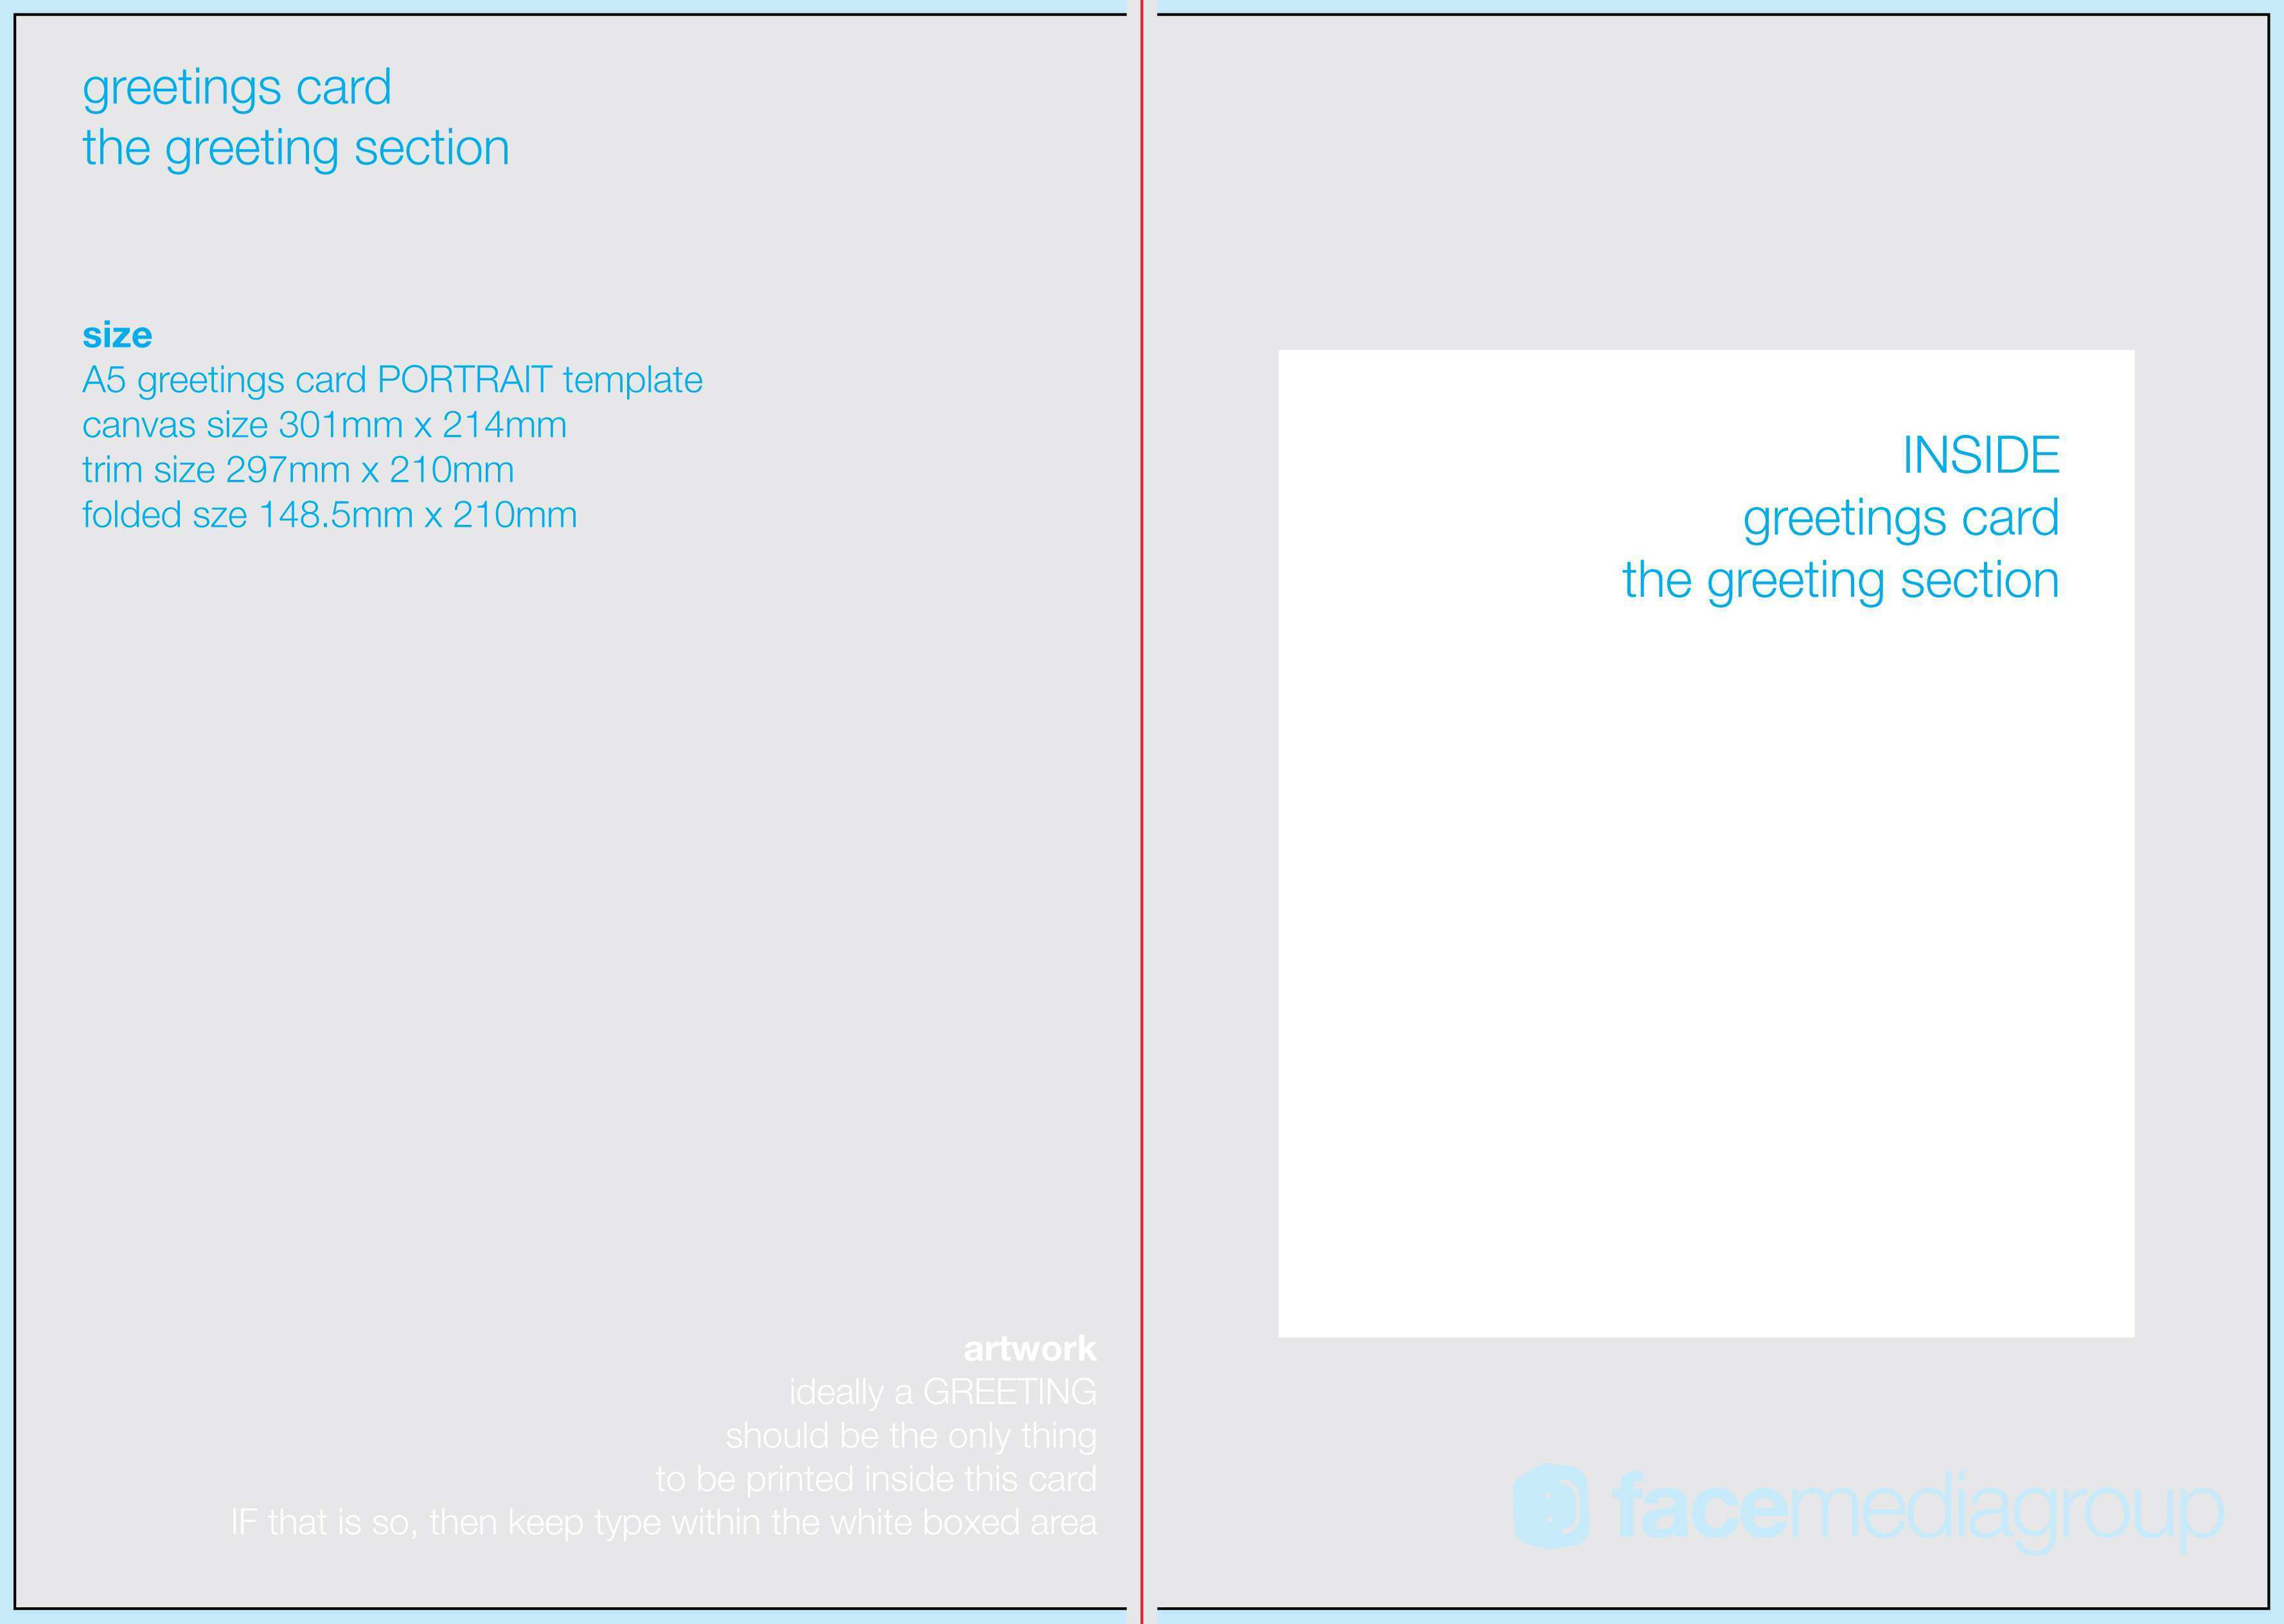 43 Creating Christmas Card Template A4 Templates for Christmas Card Template A4